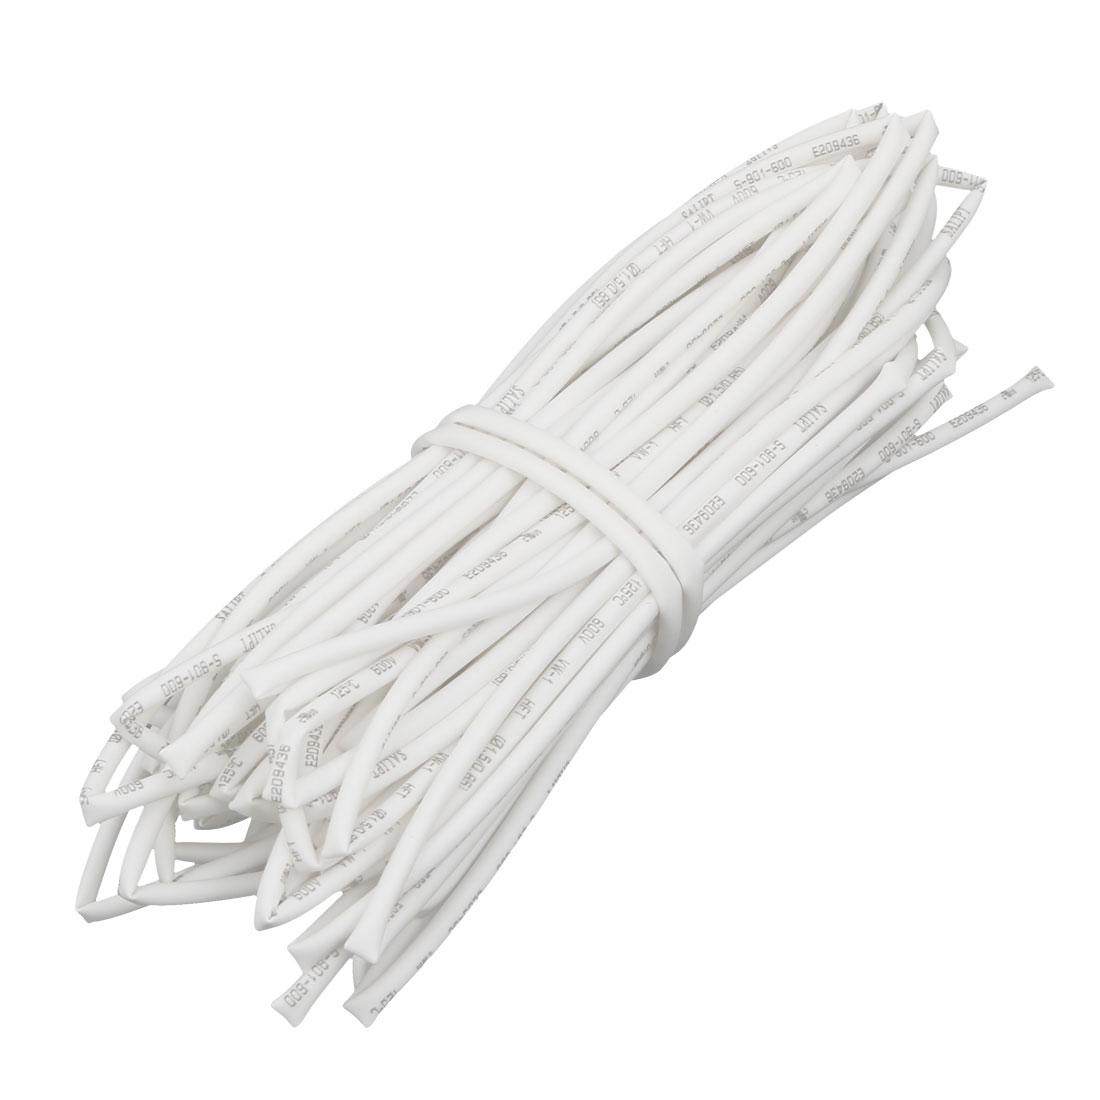 32.8Ft Length 1.5mm Inner Dia Insulated Heat Shrink Tube Sleeve Wire Wrap White